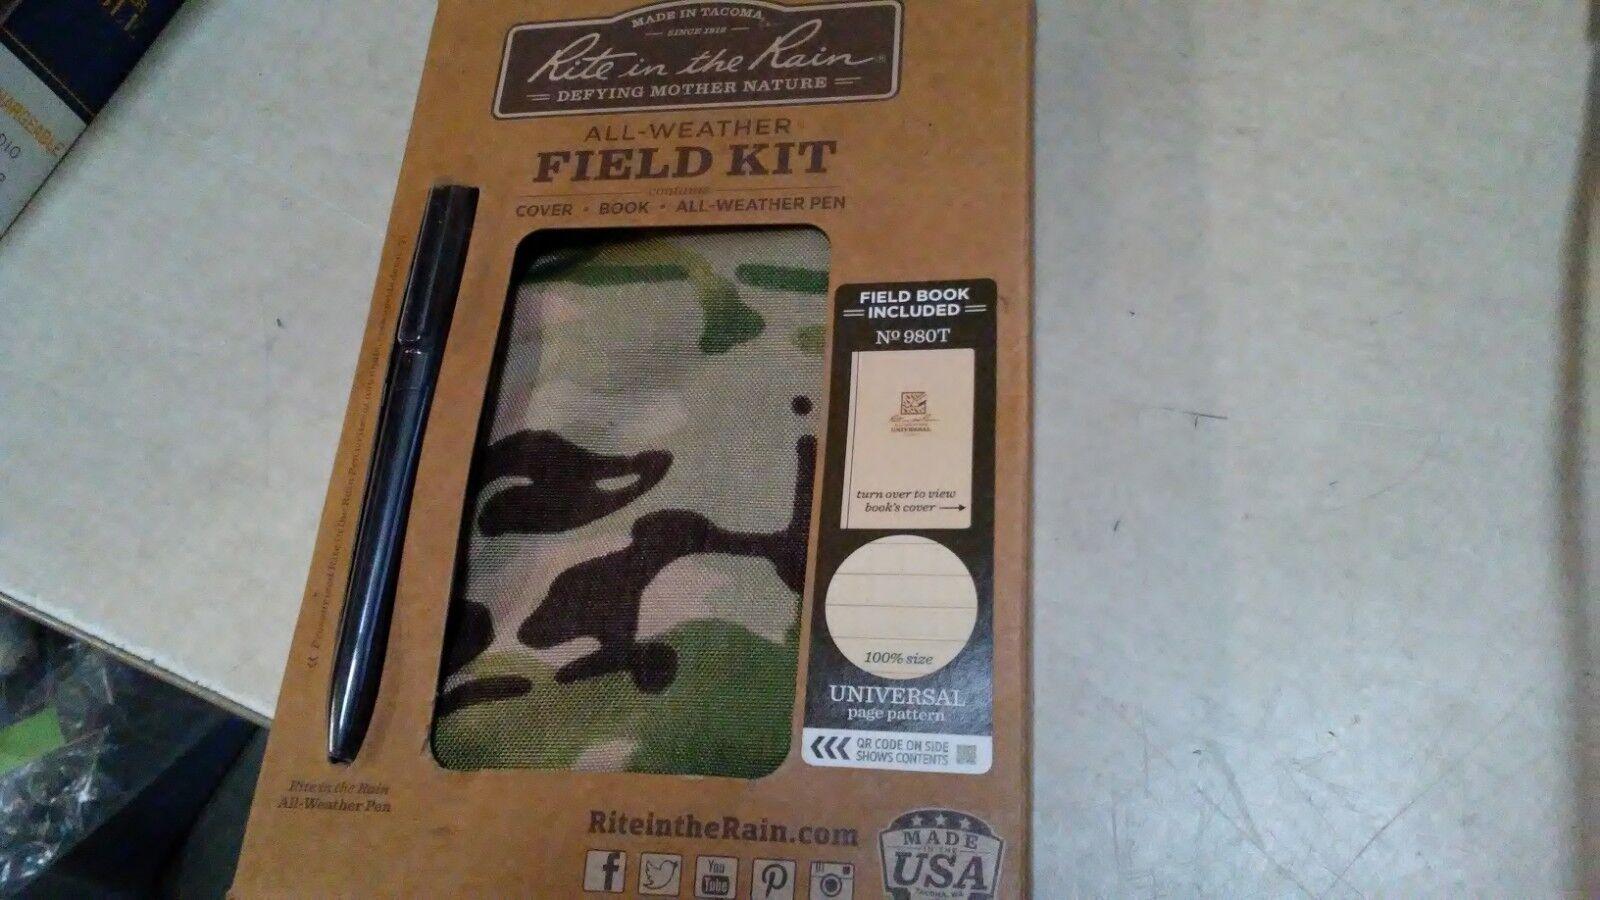 Rite in the Rain 980M-Kit All-Weather Universal Field-Flex Book Kit,Tan MultiCam